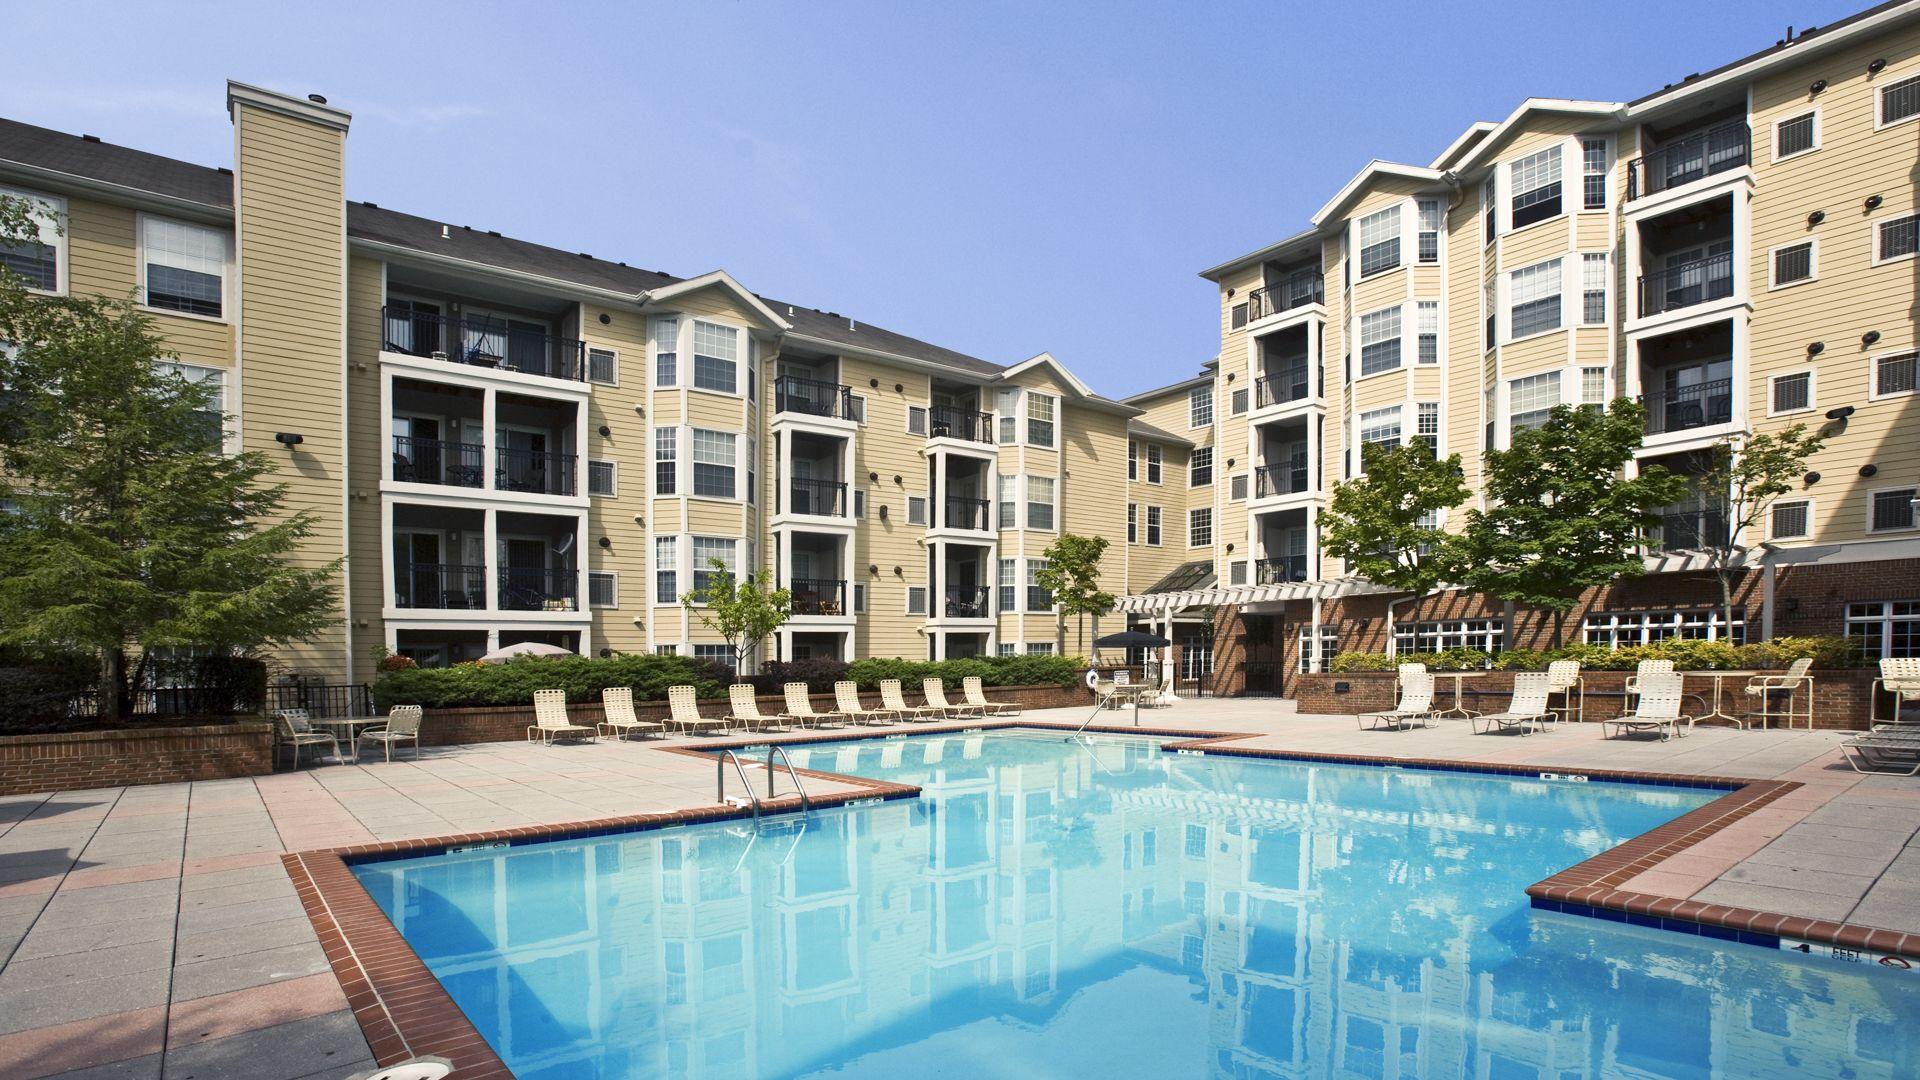 Fairfield Apartments - Pool